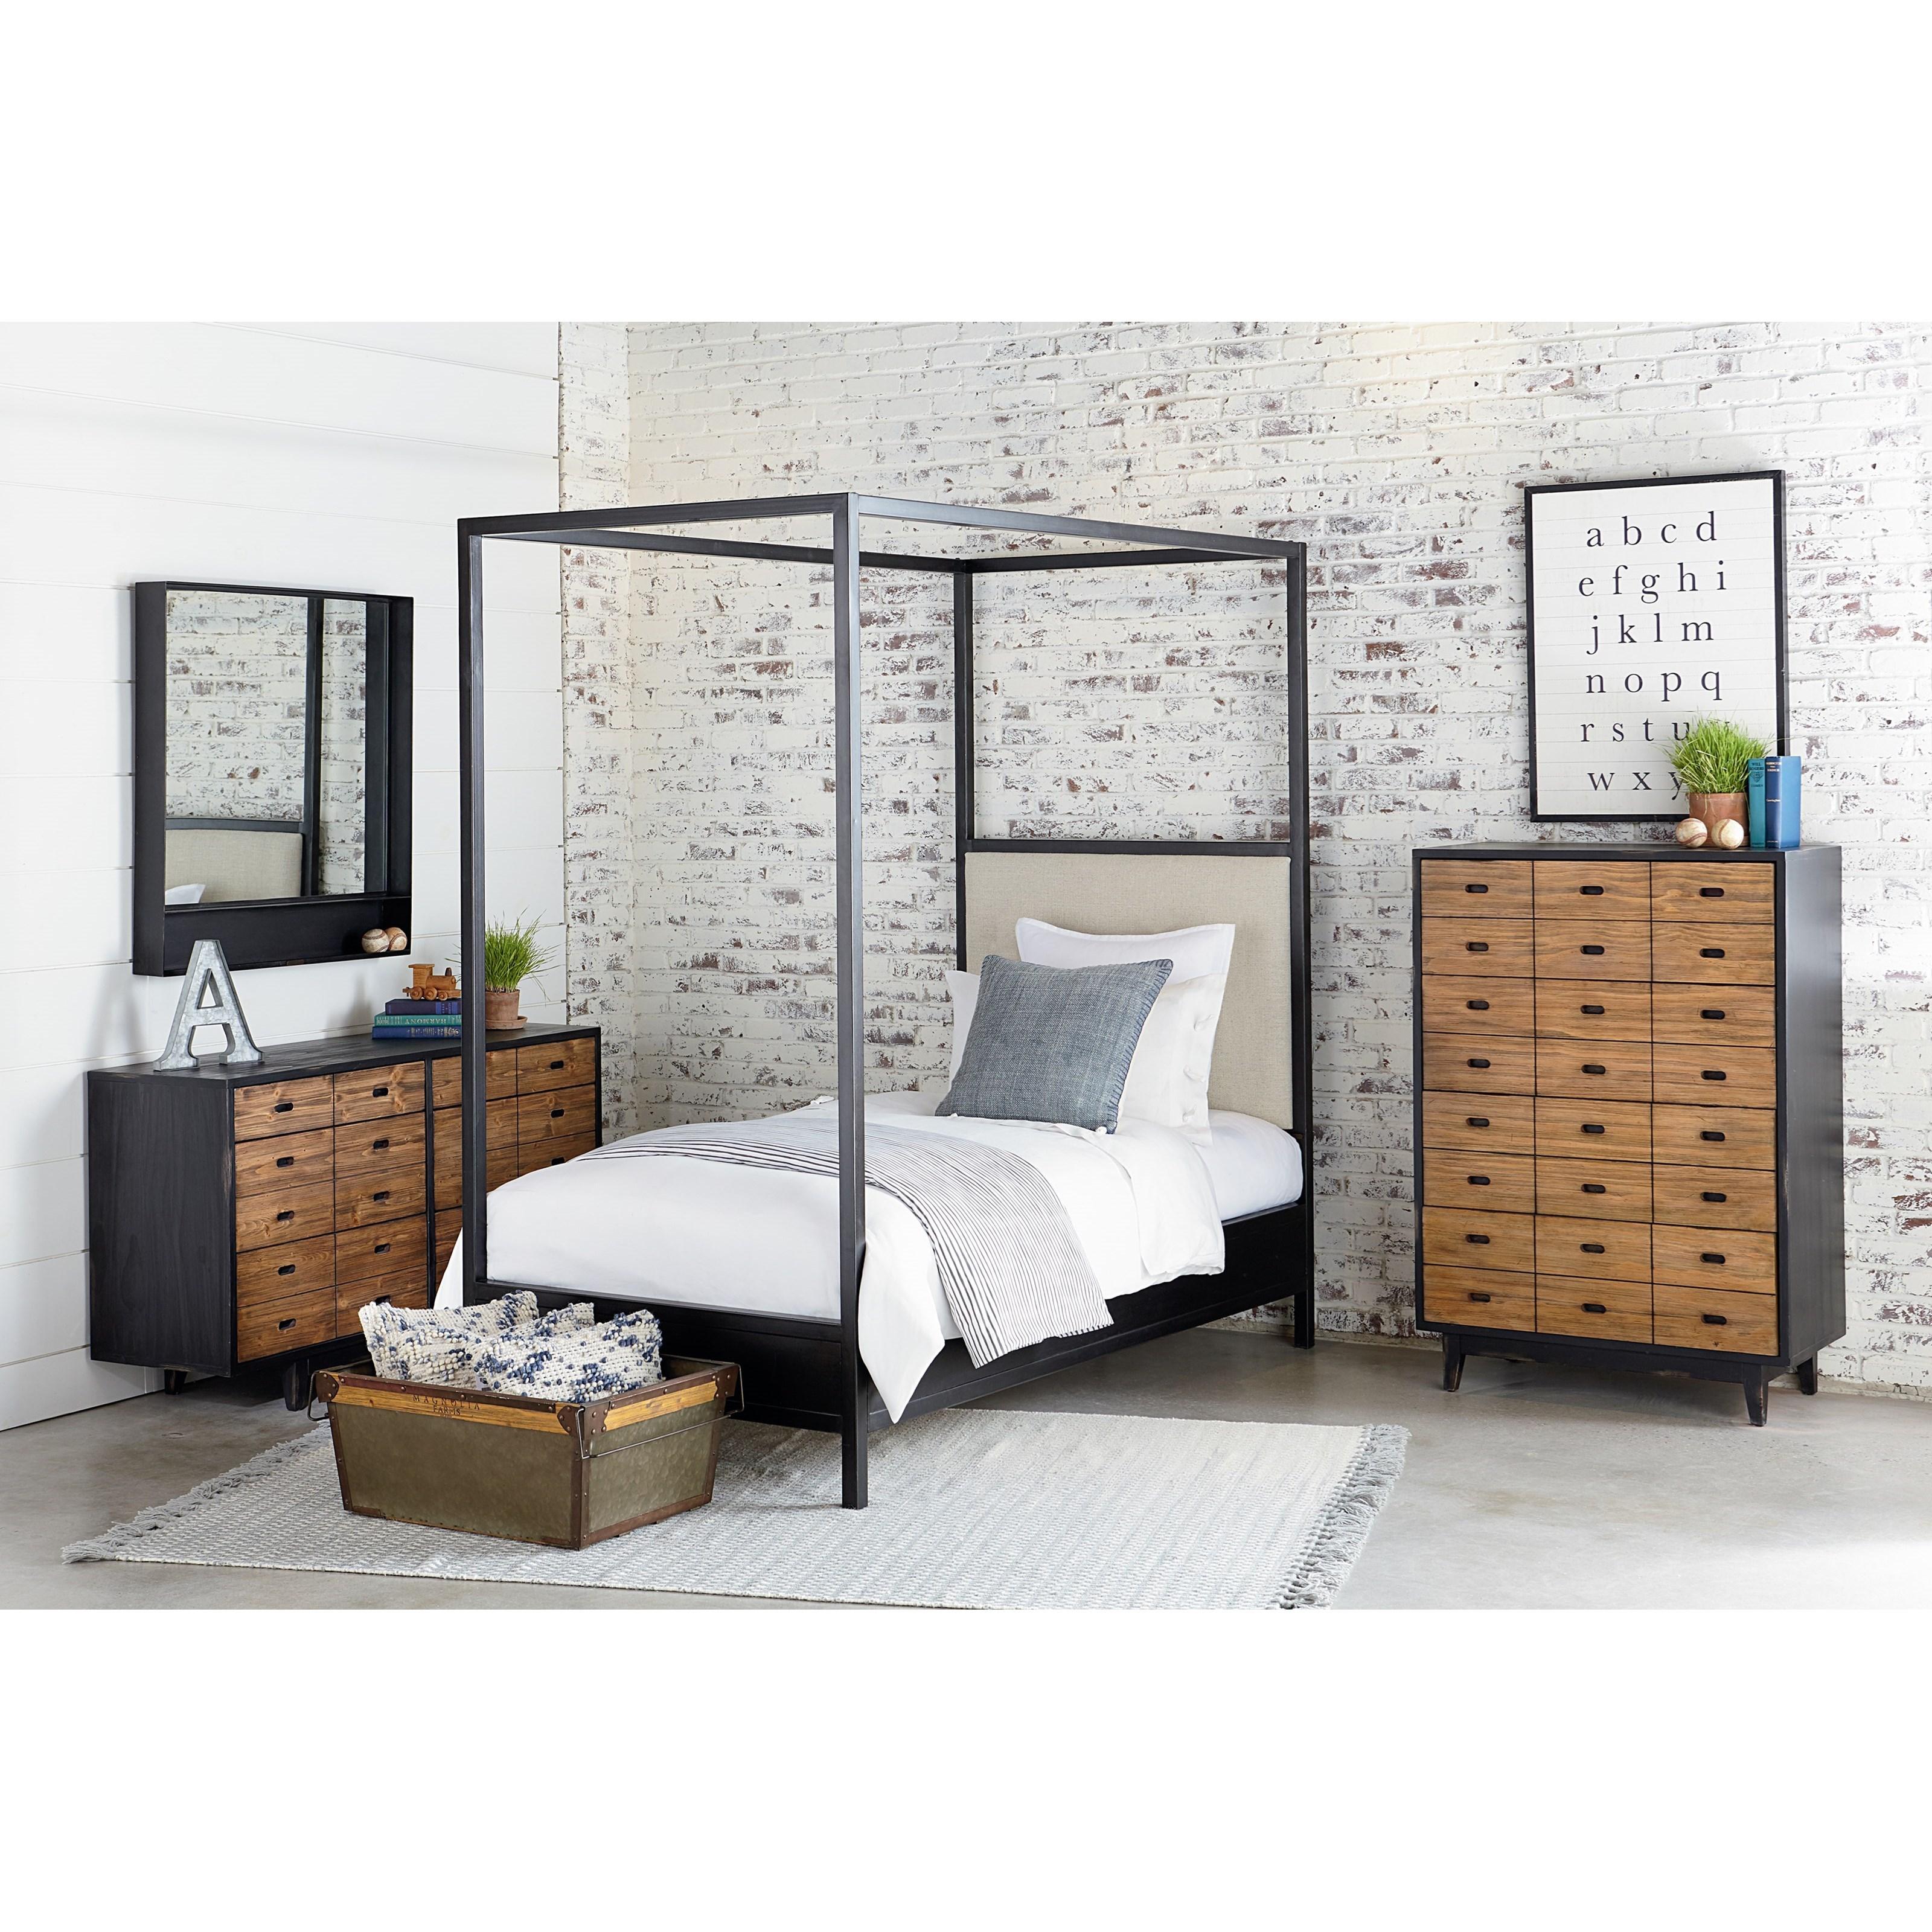 Magnolia Home by Joanna Gaines Industrial Framework Full Bedroom